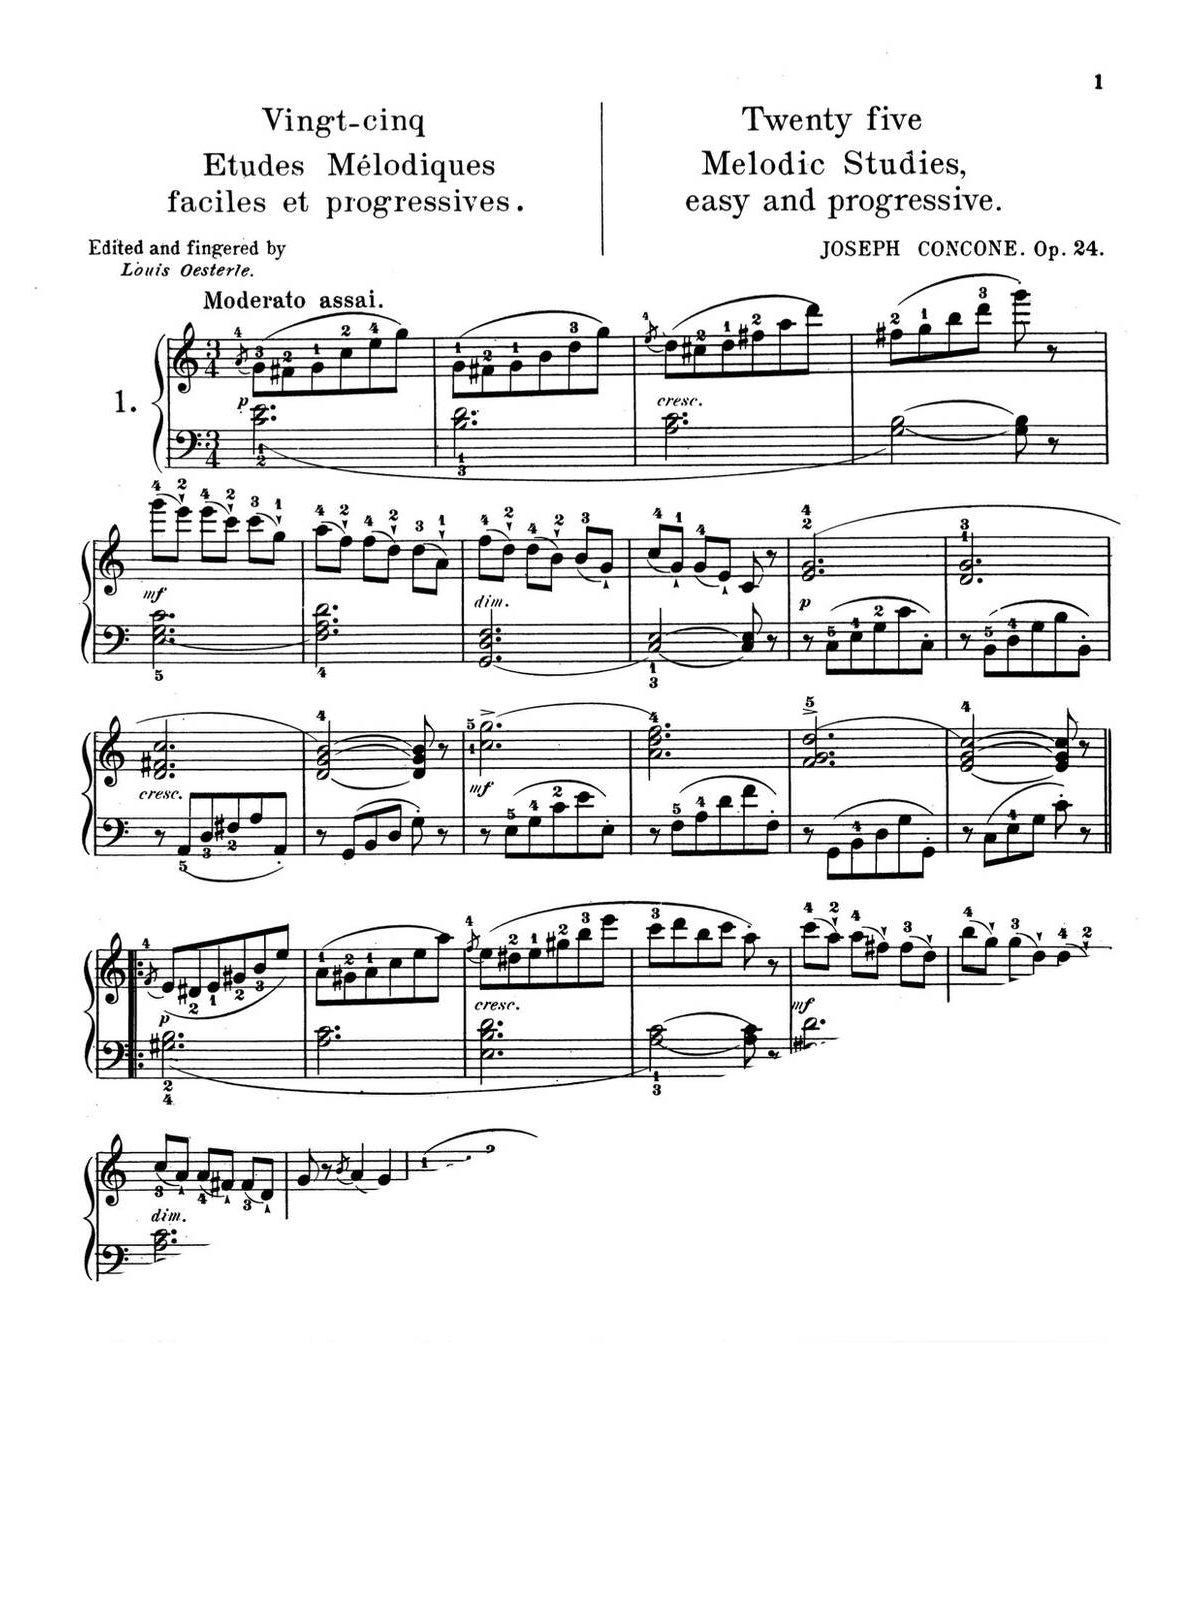 Concone, 25 Melodic Studies, Op.24-p03